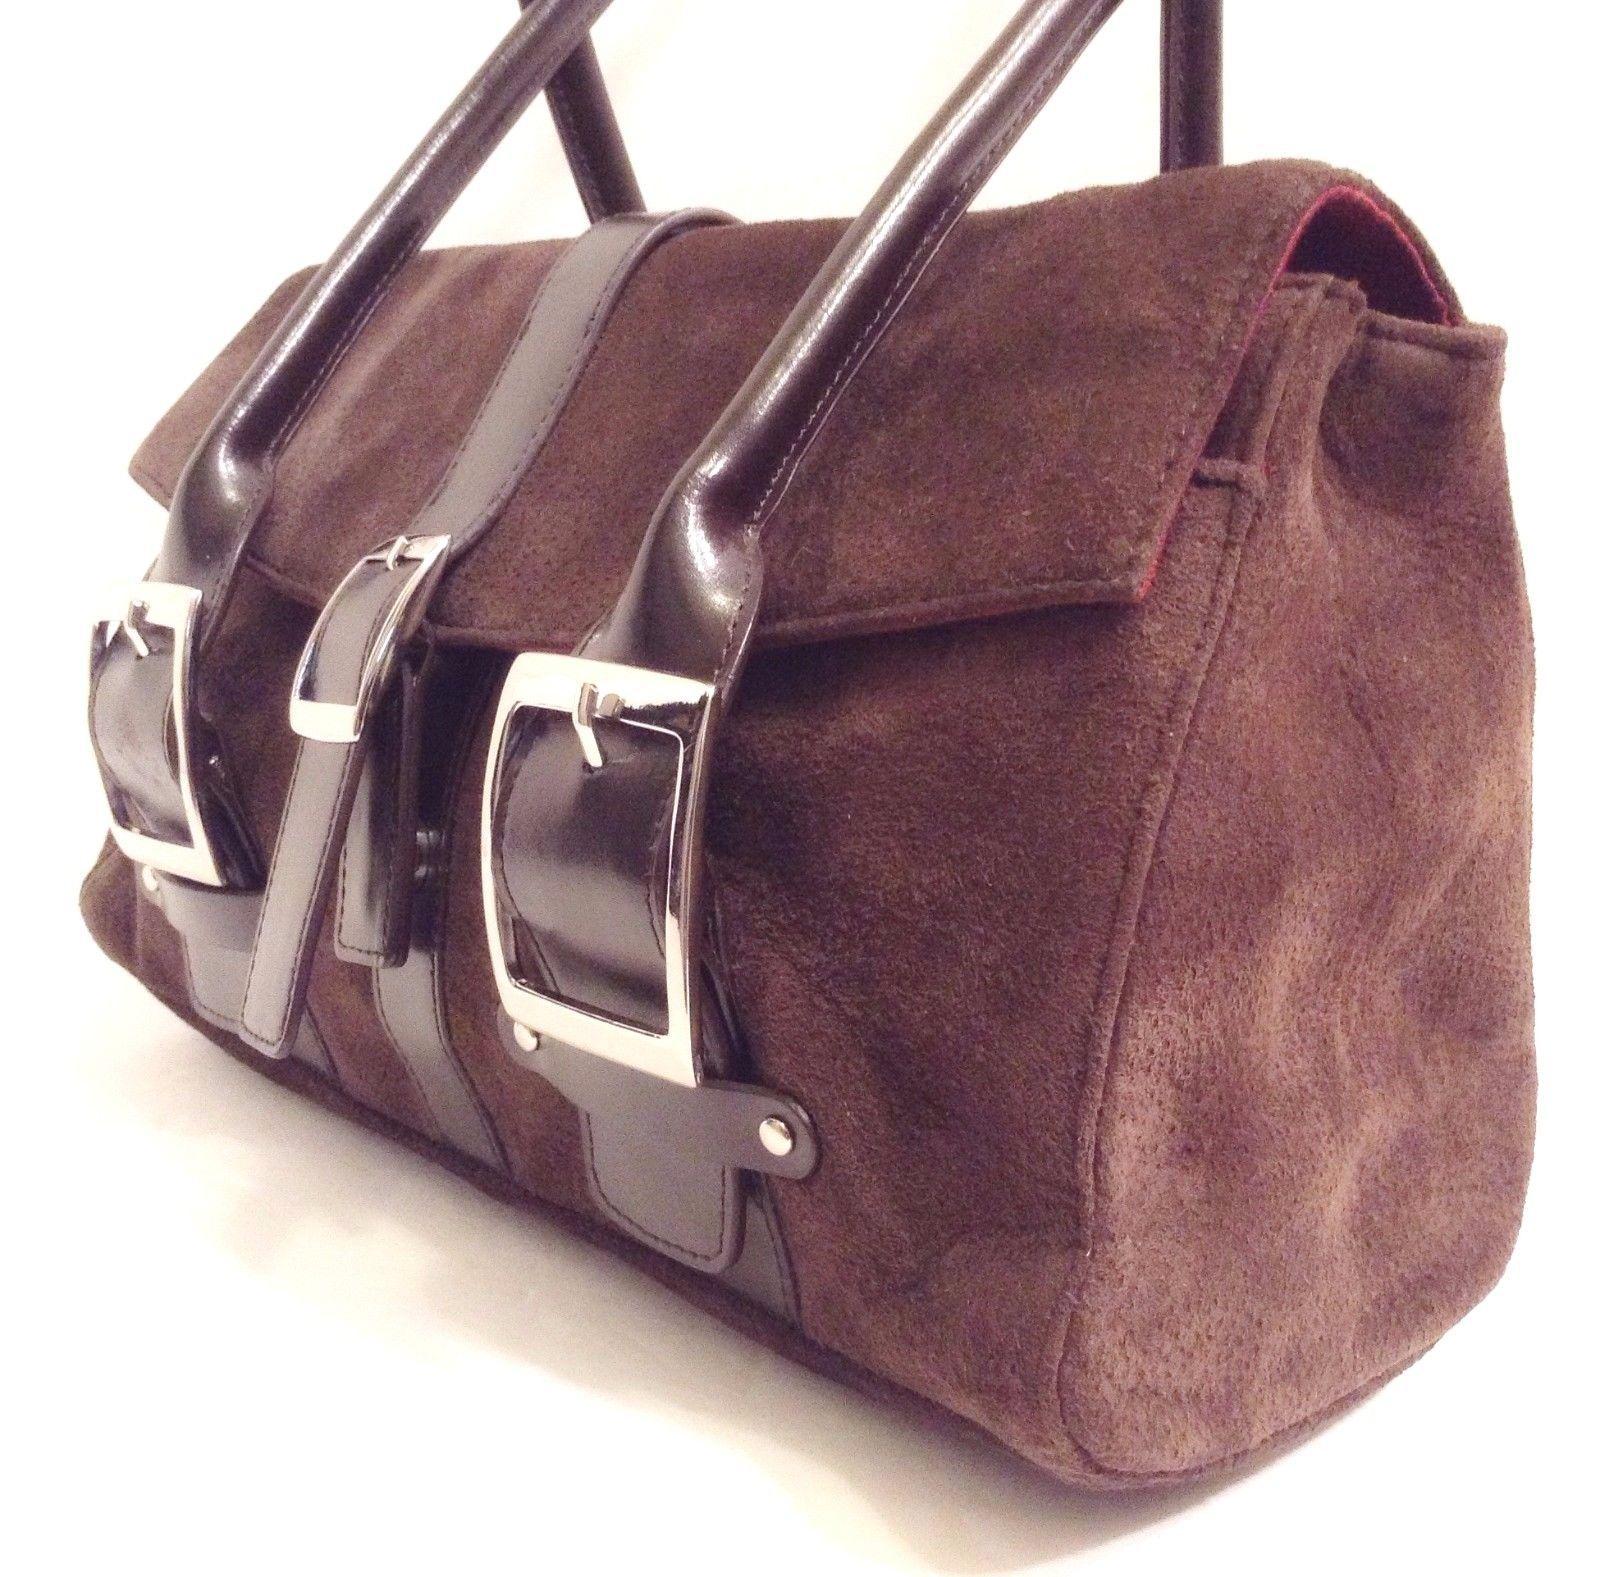 Wilsons Leather Pelle Studio Brown Suede Handbag Shoulder Bag